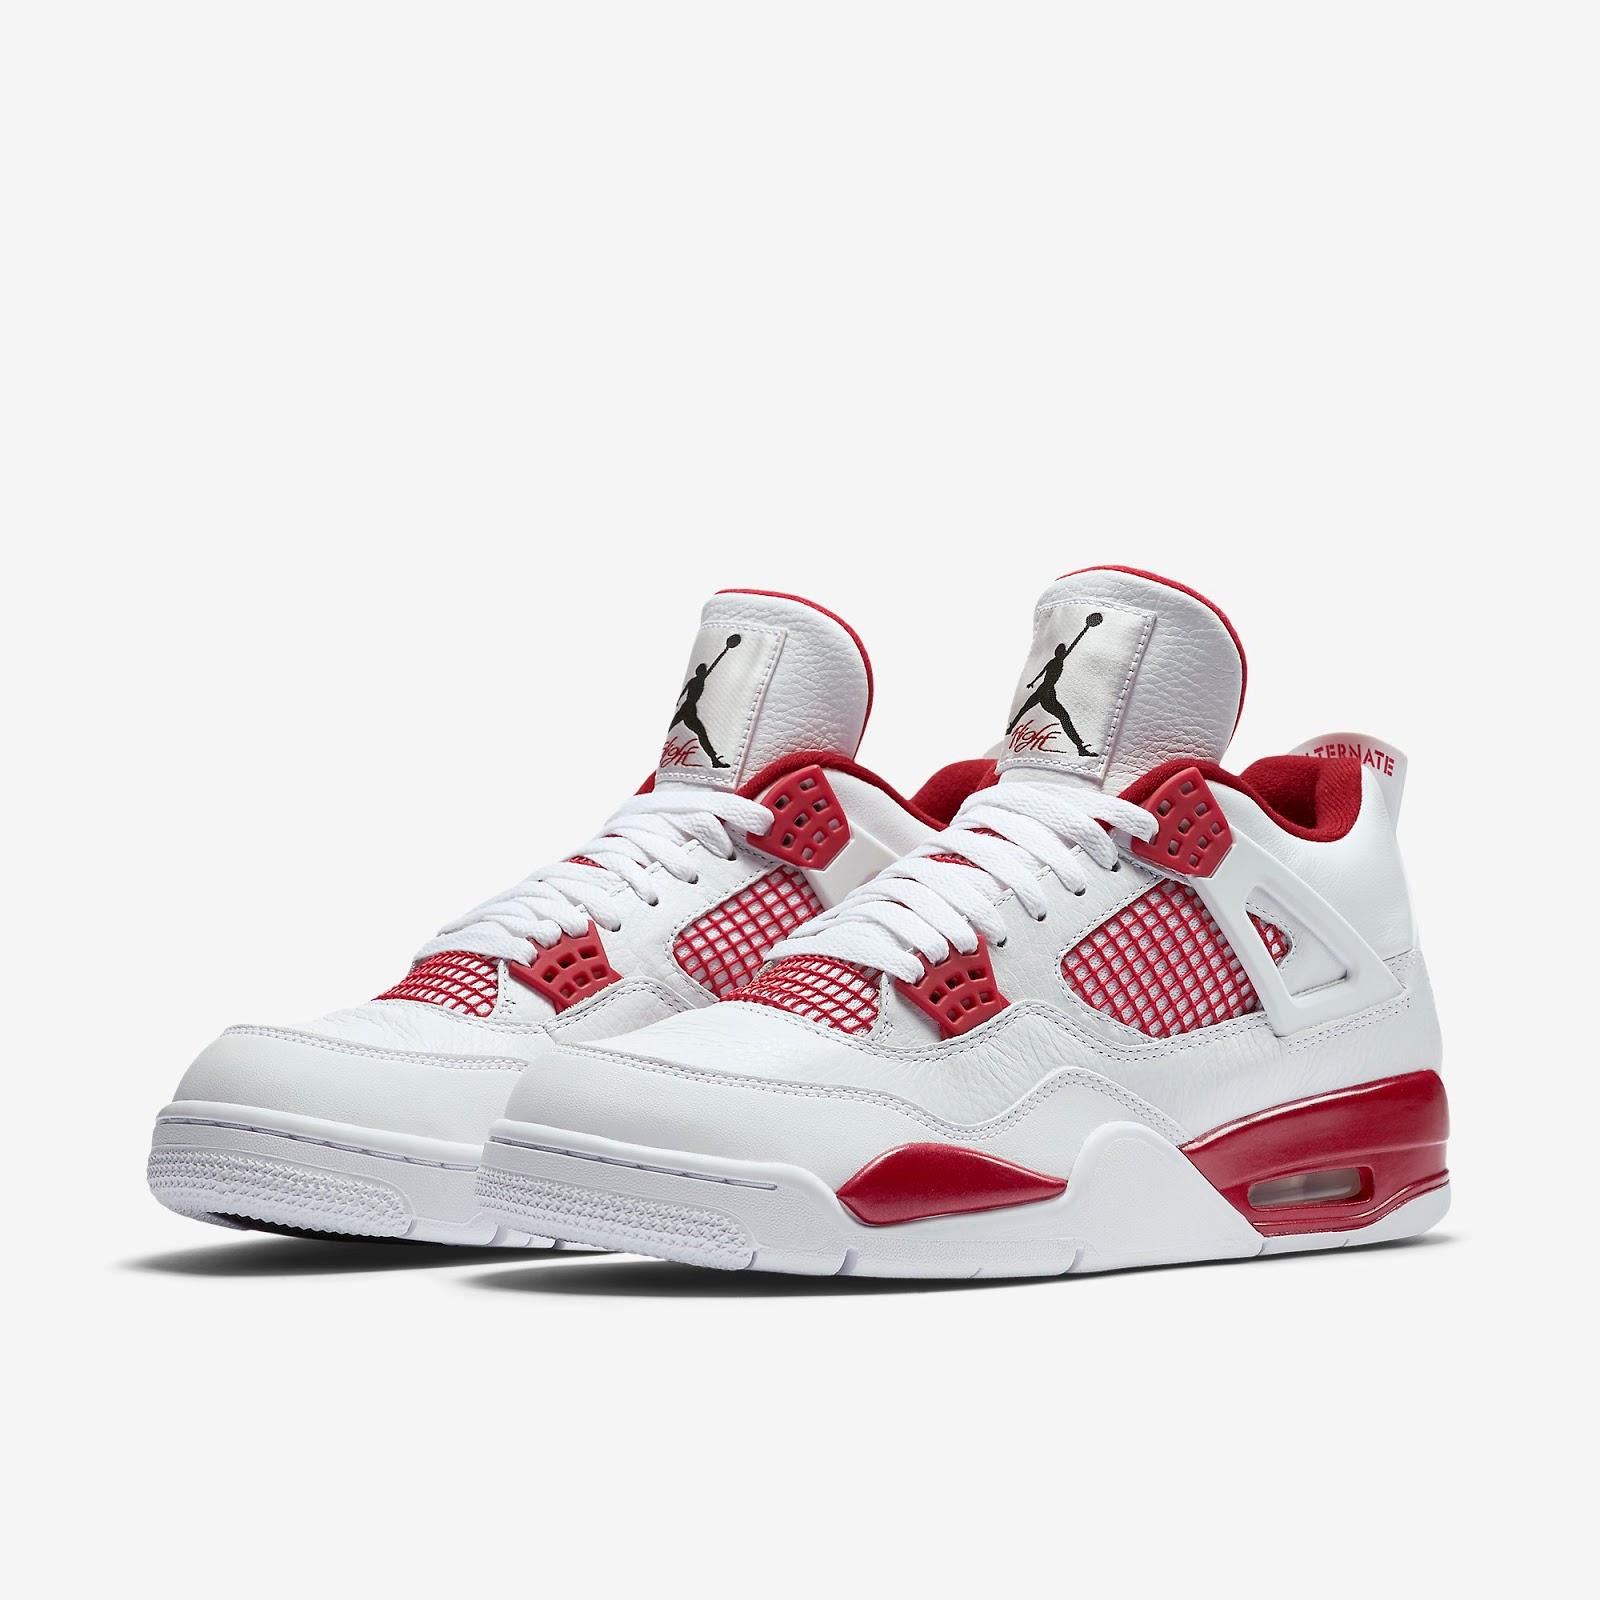 separation shoes 2b6d6 678a5 Air Jordan 4 Retro